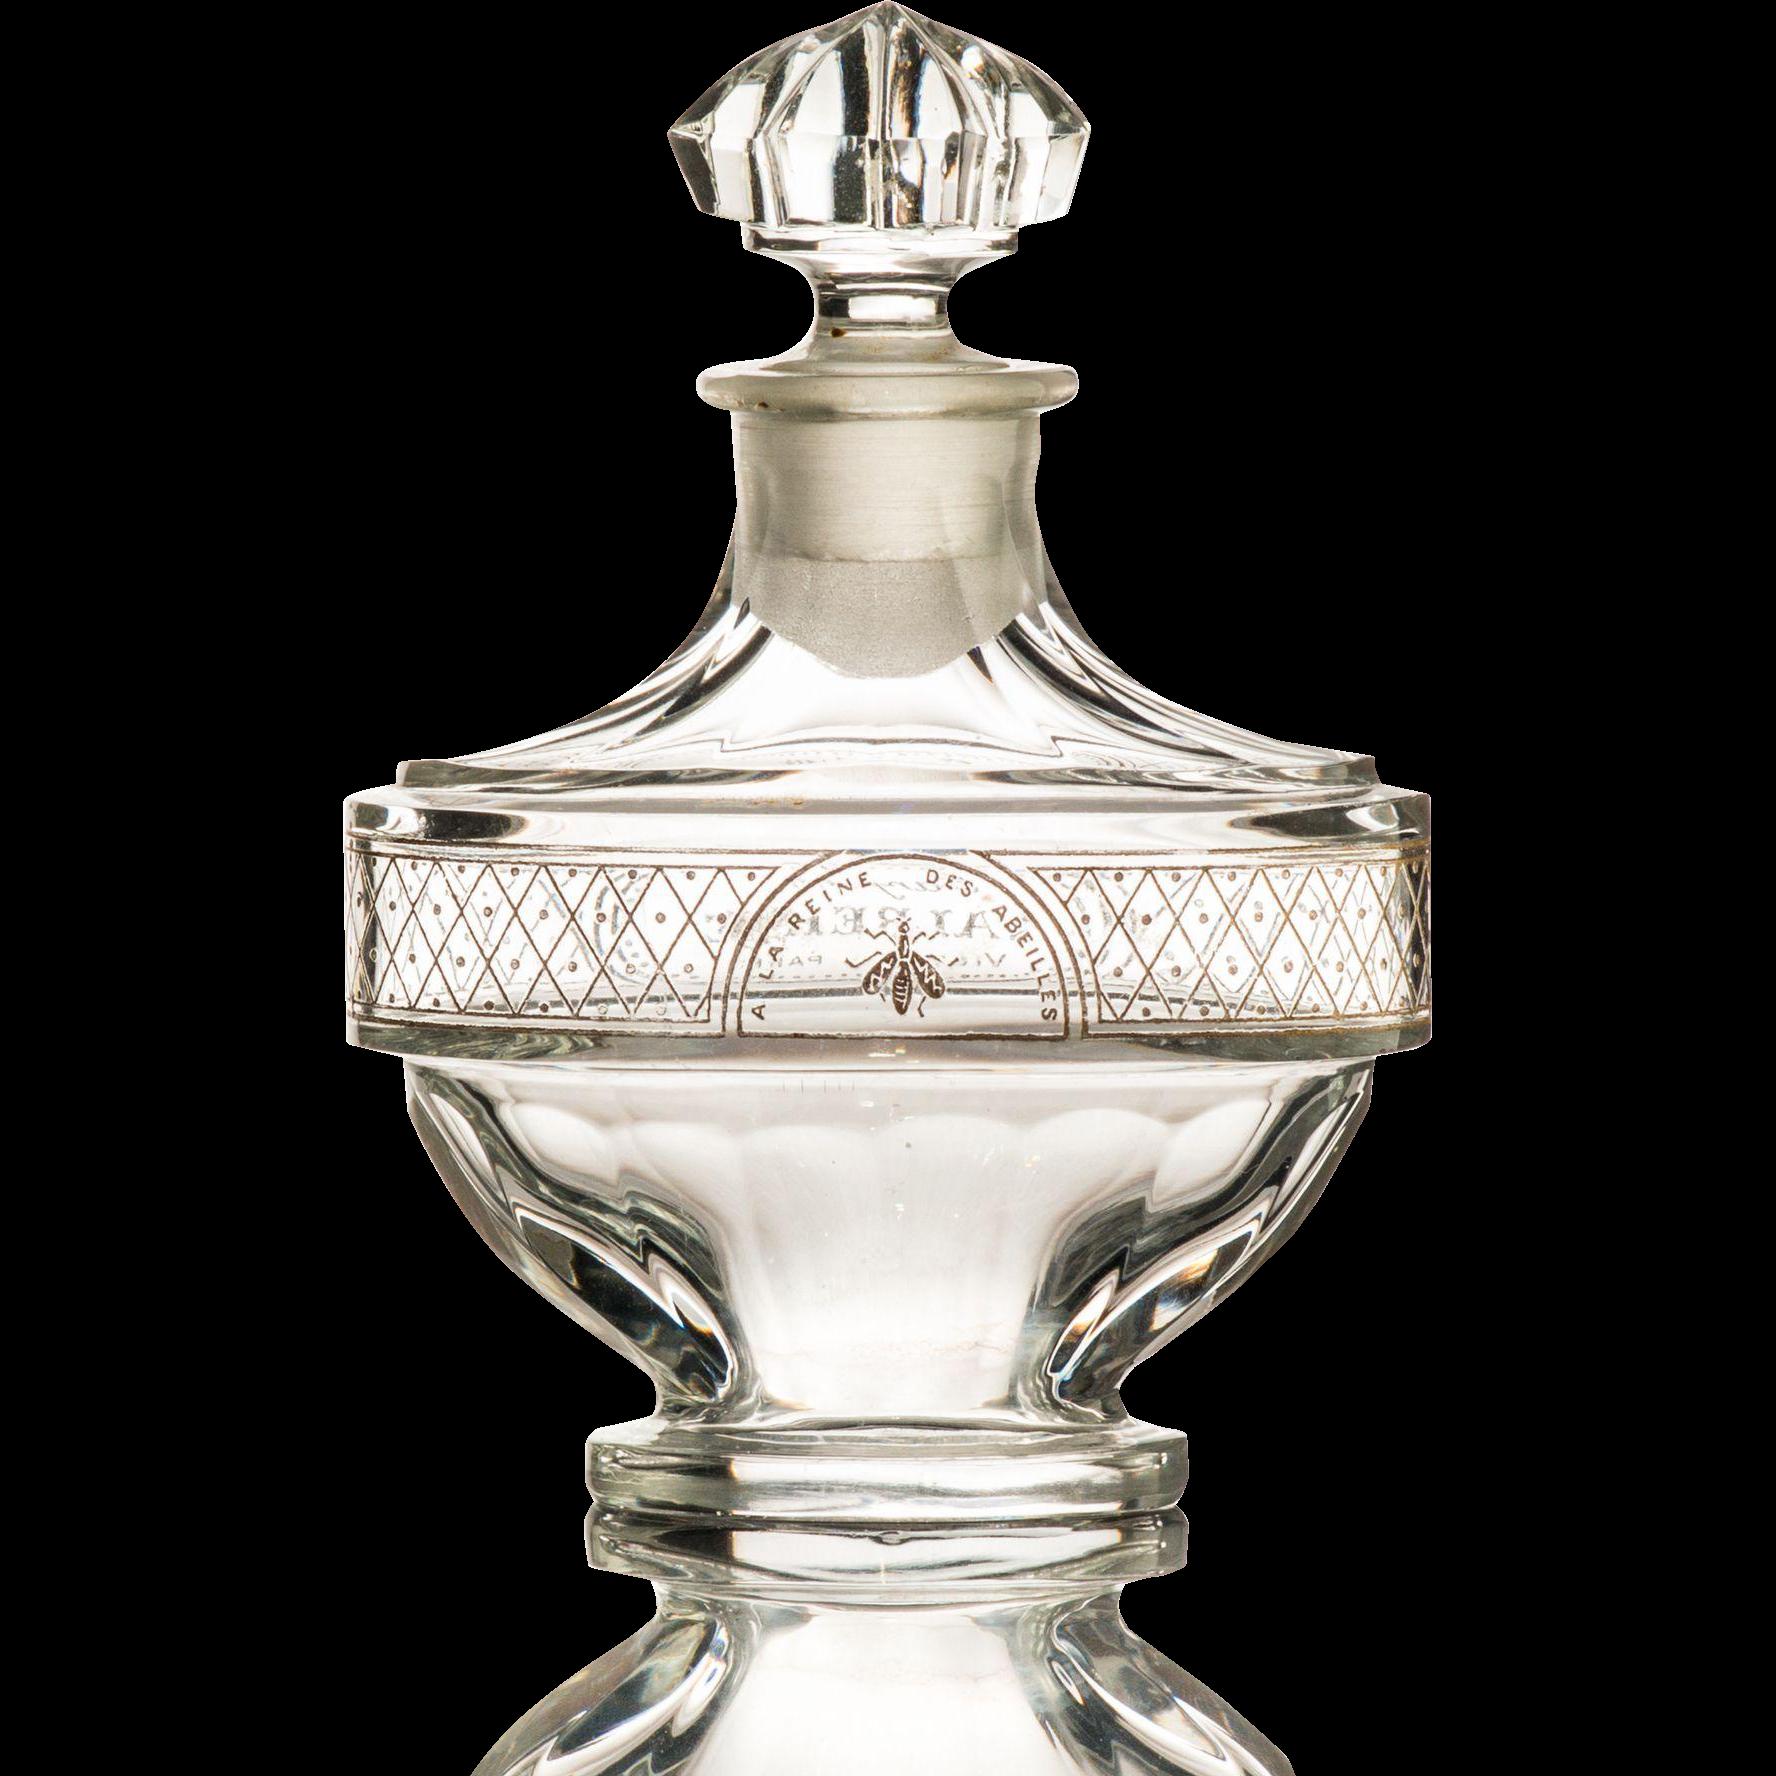 Vintage Perfume Bottle by Baccarat for Parfumerie Violet Valreine ...